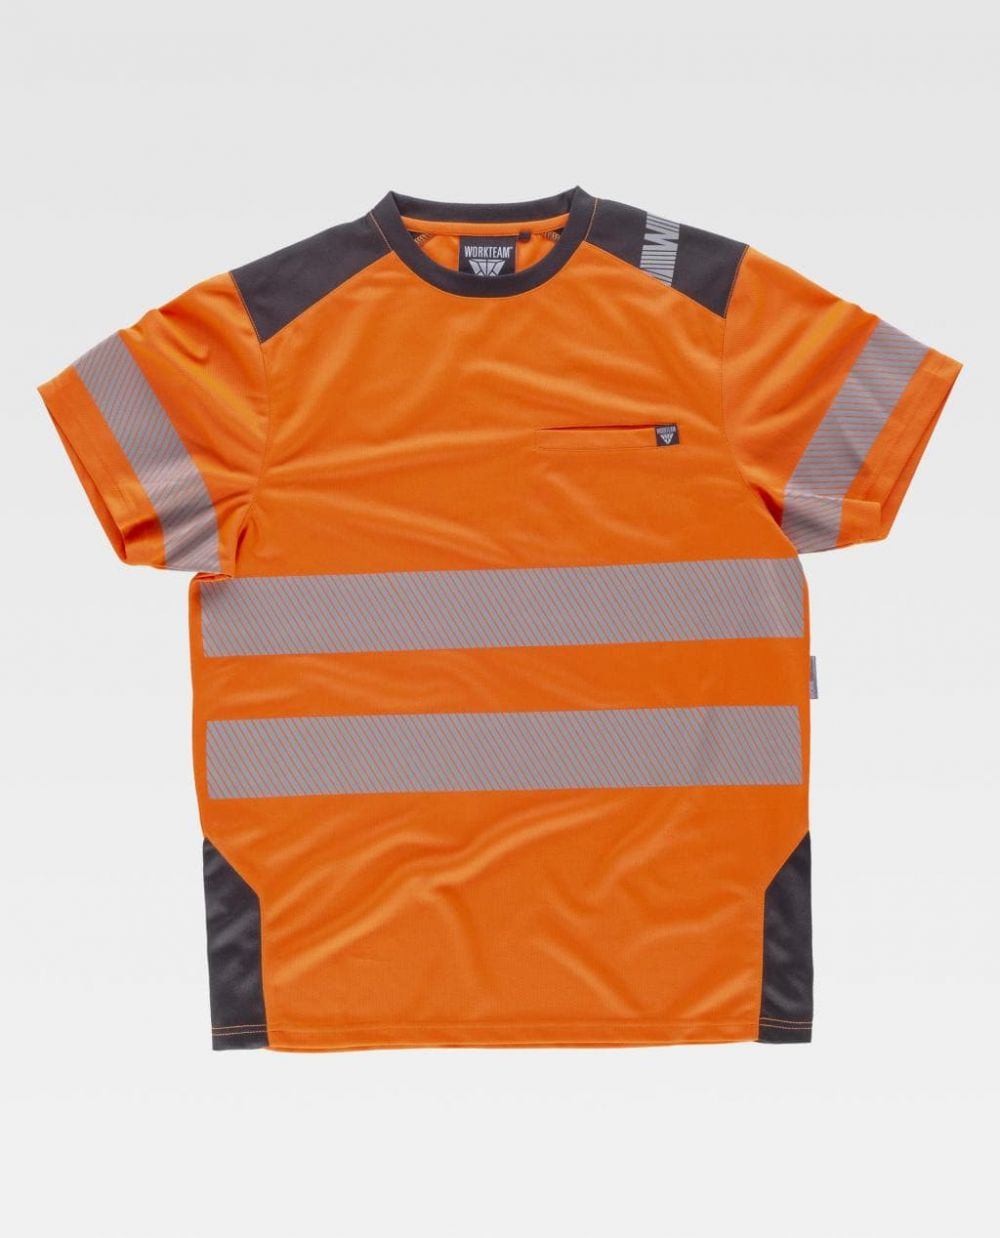 Camisetas reflectante workteam mc alta visibilidad combinada de poliéster vista 1